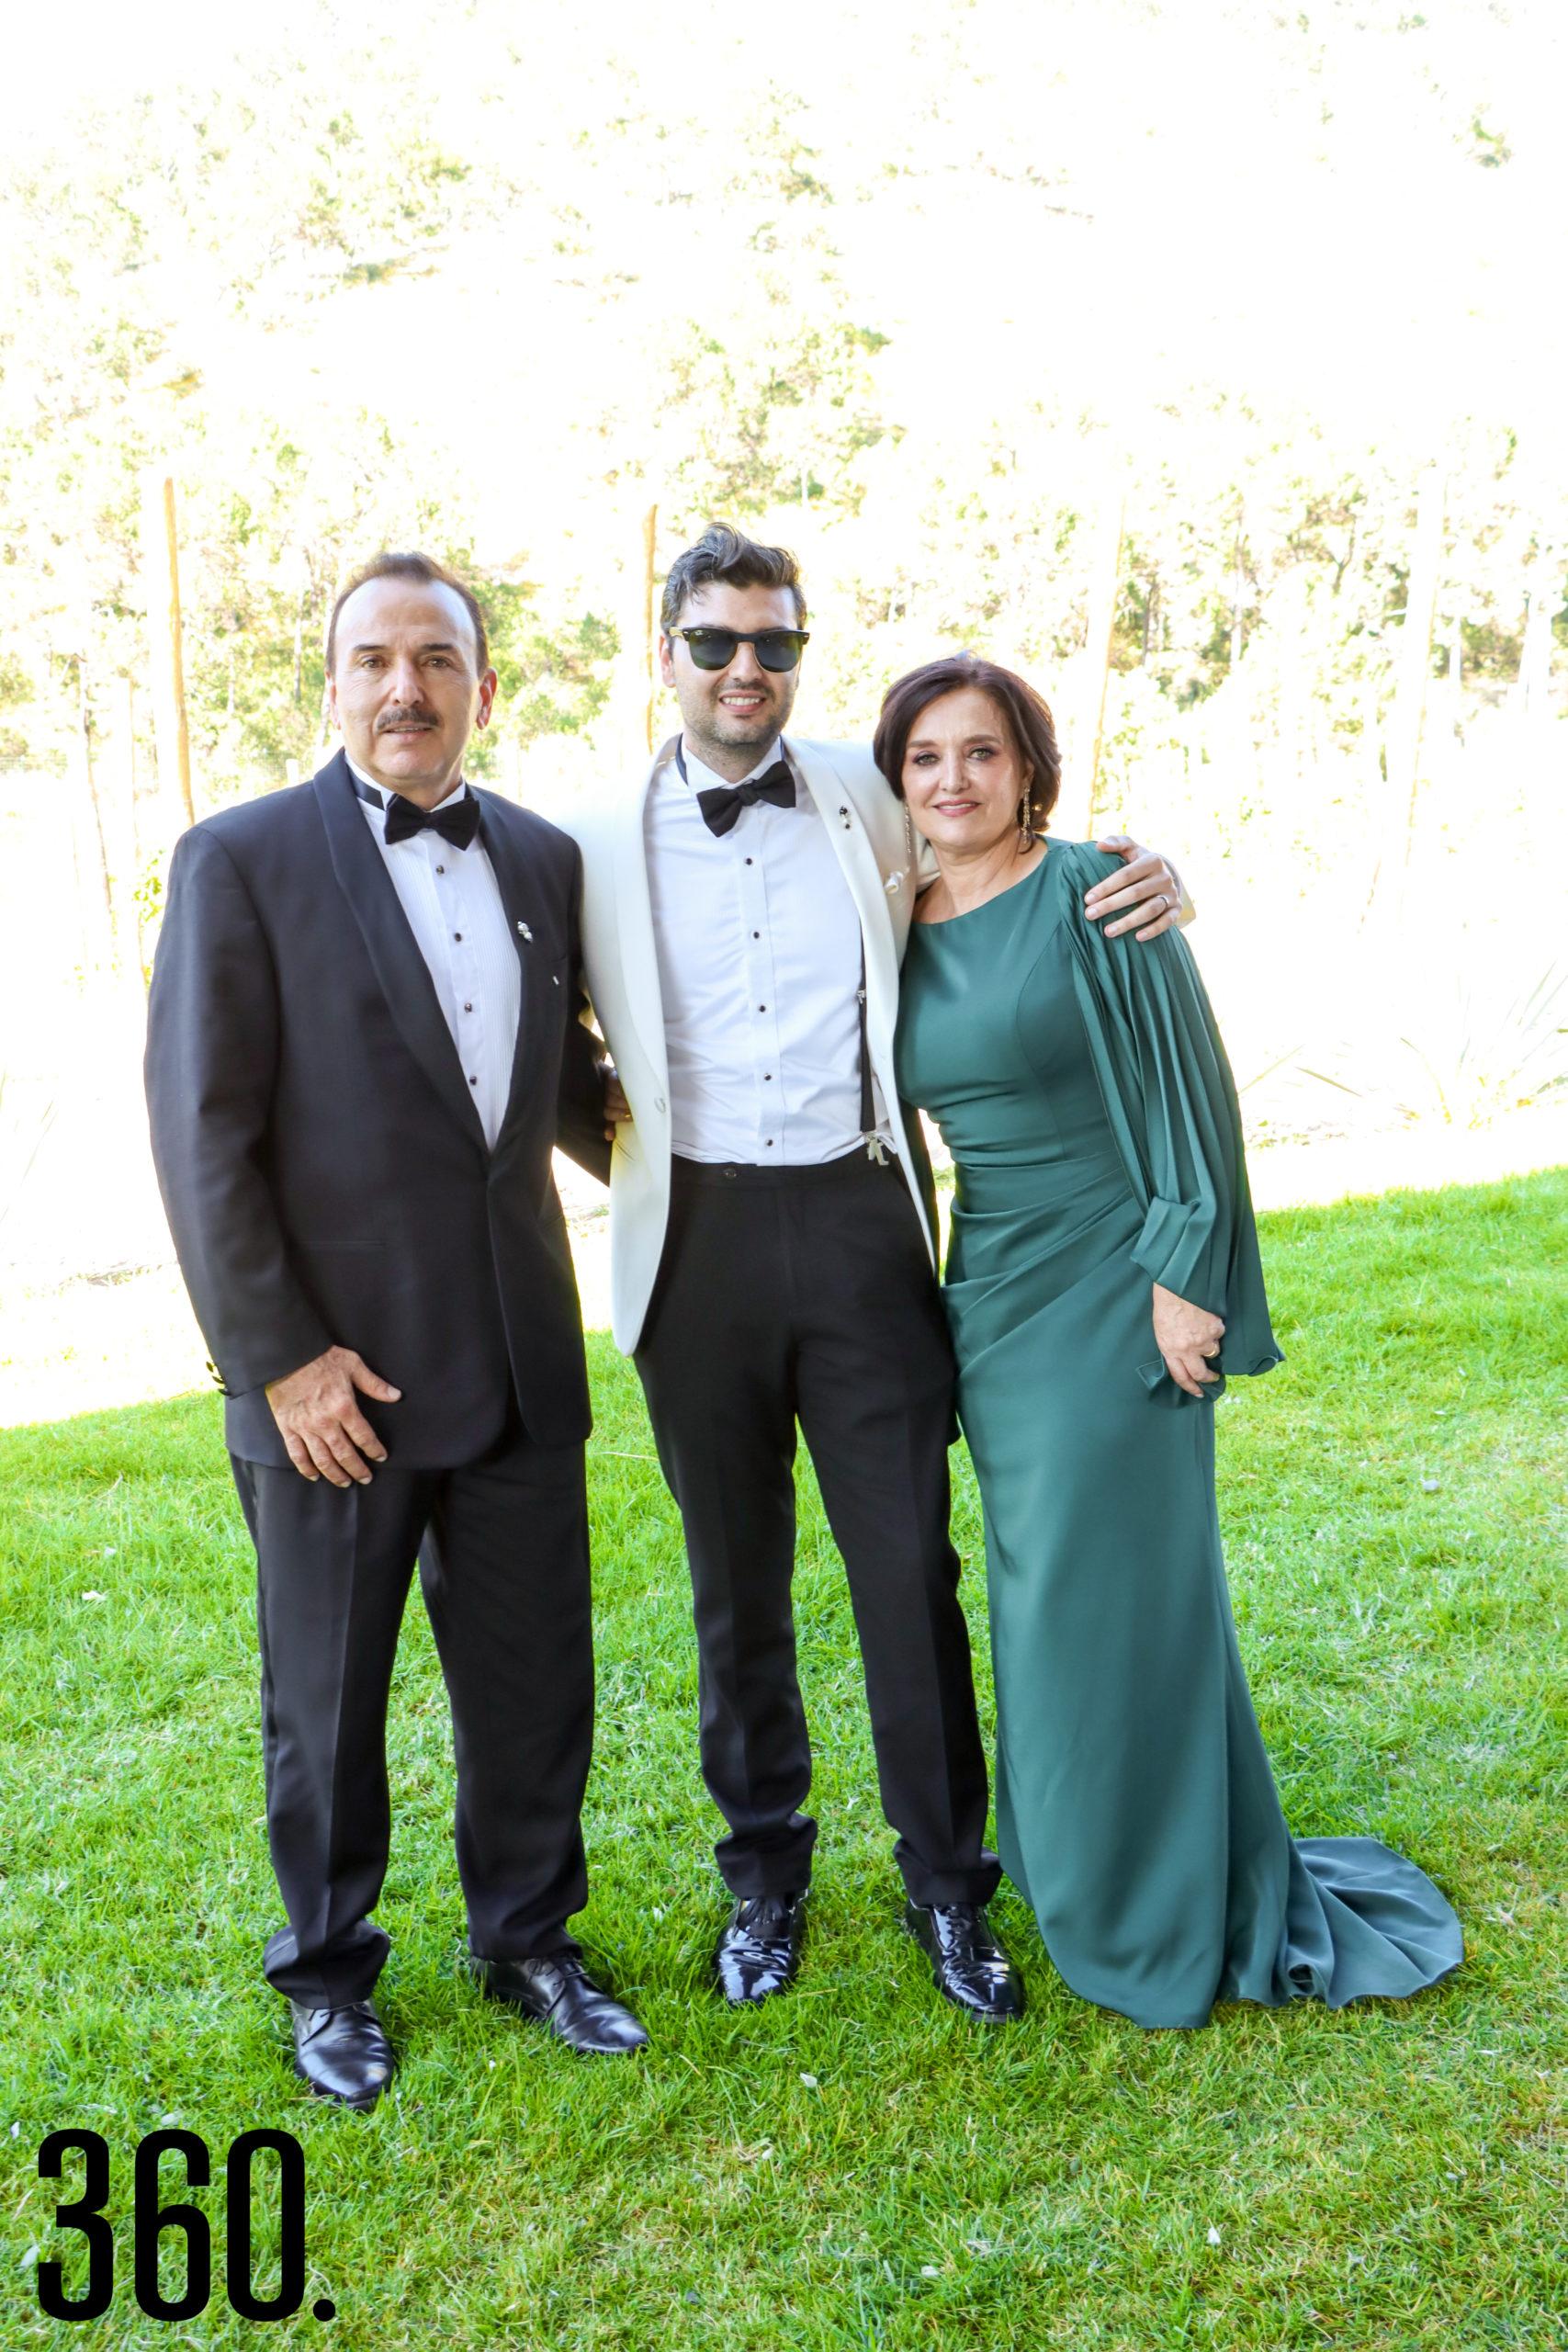 Juan José Méndez con sus padres, Juan José Méndez y Sandra Aguilar.